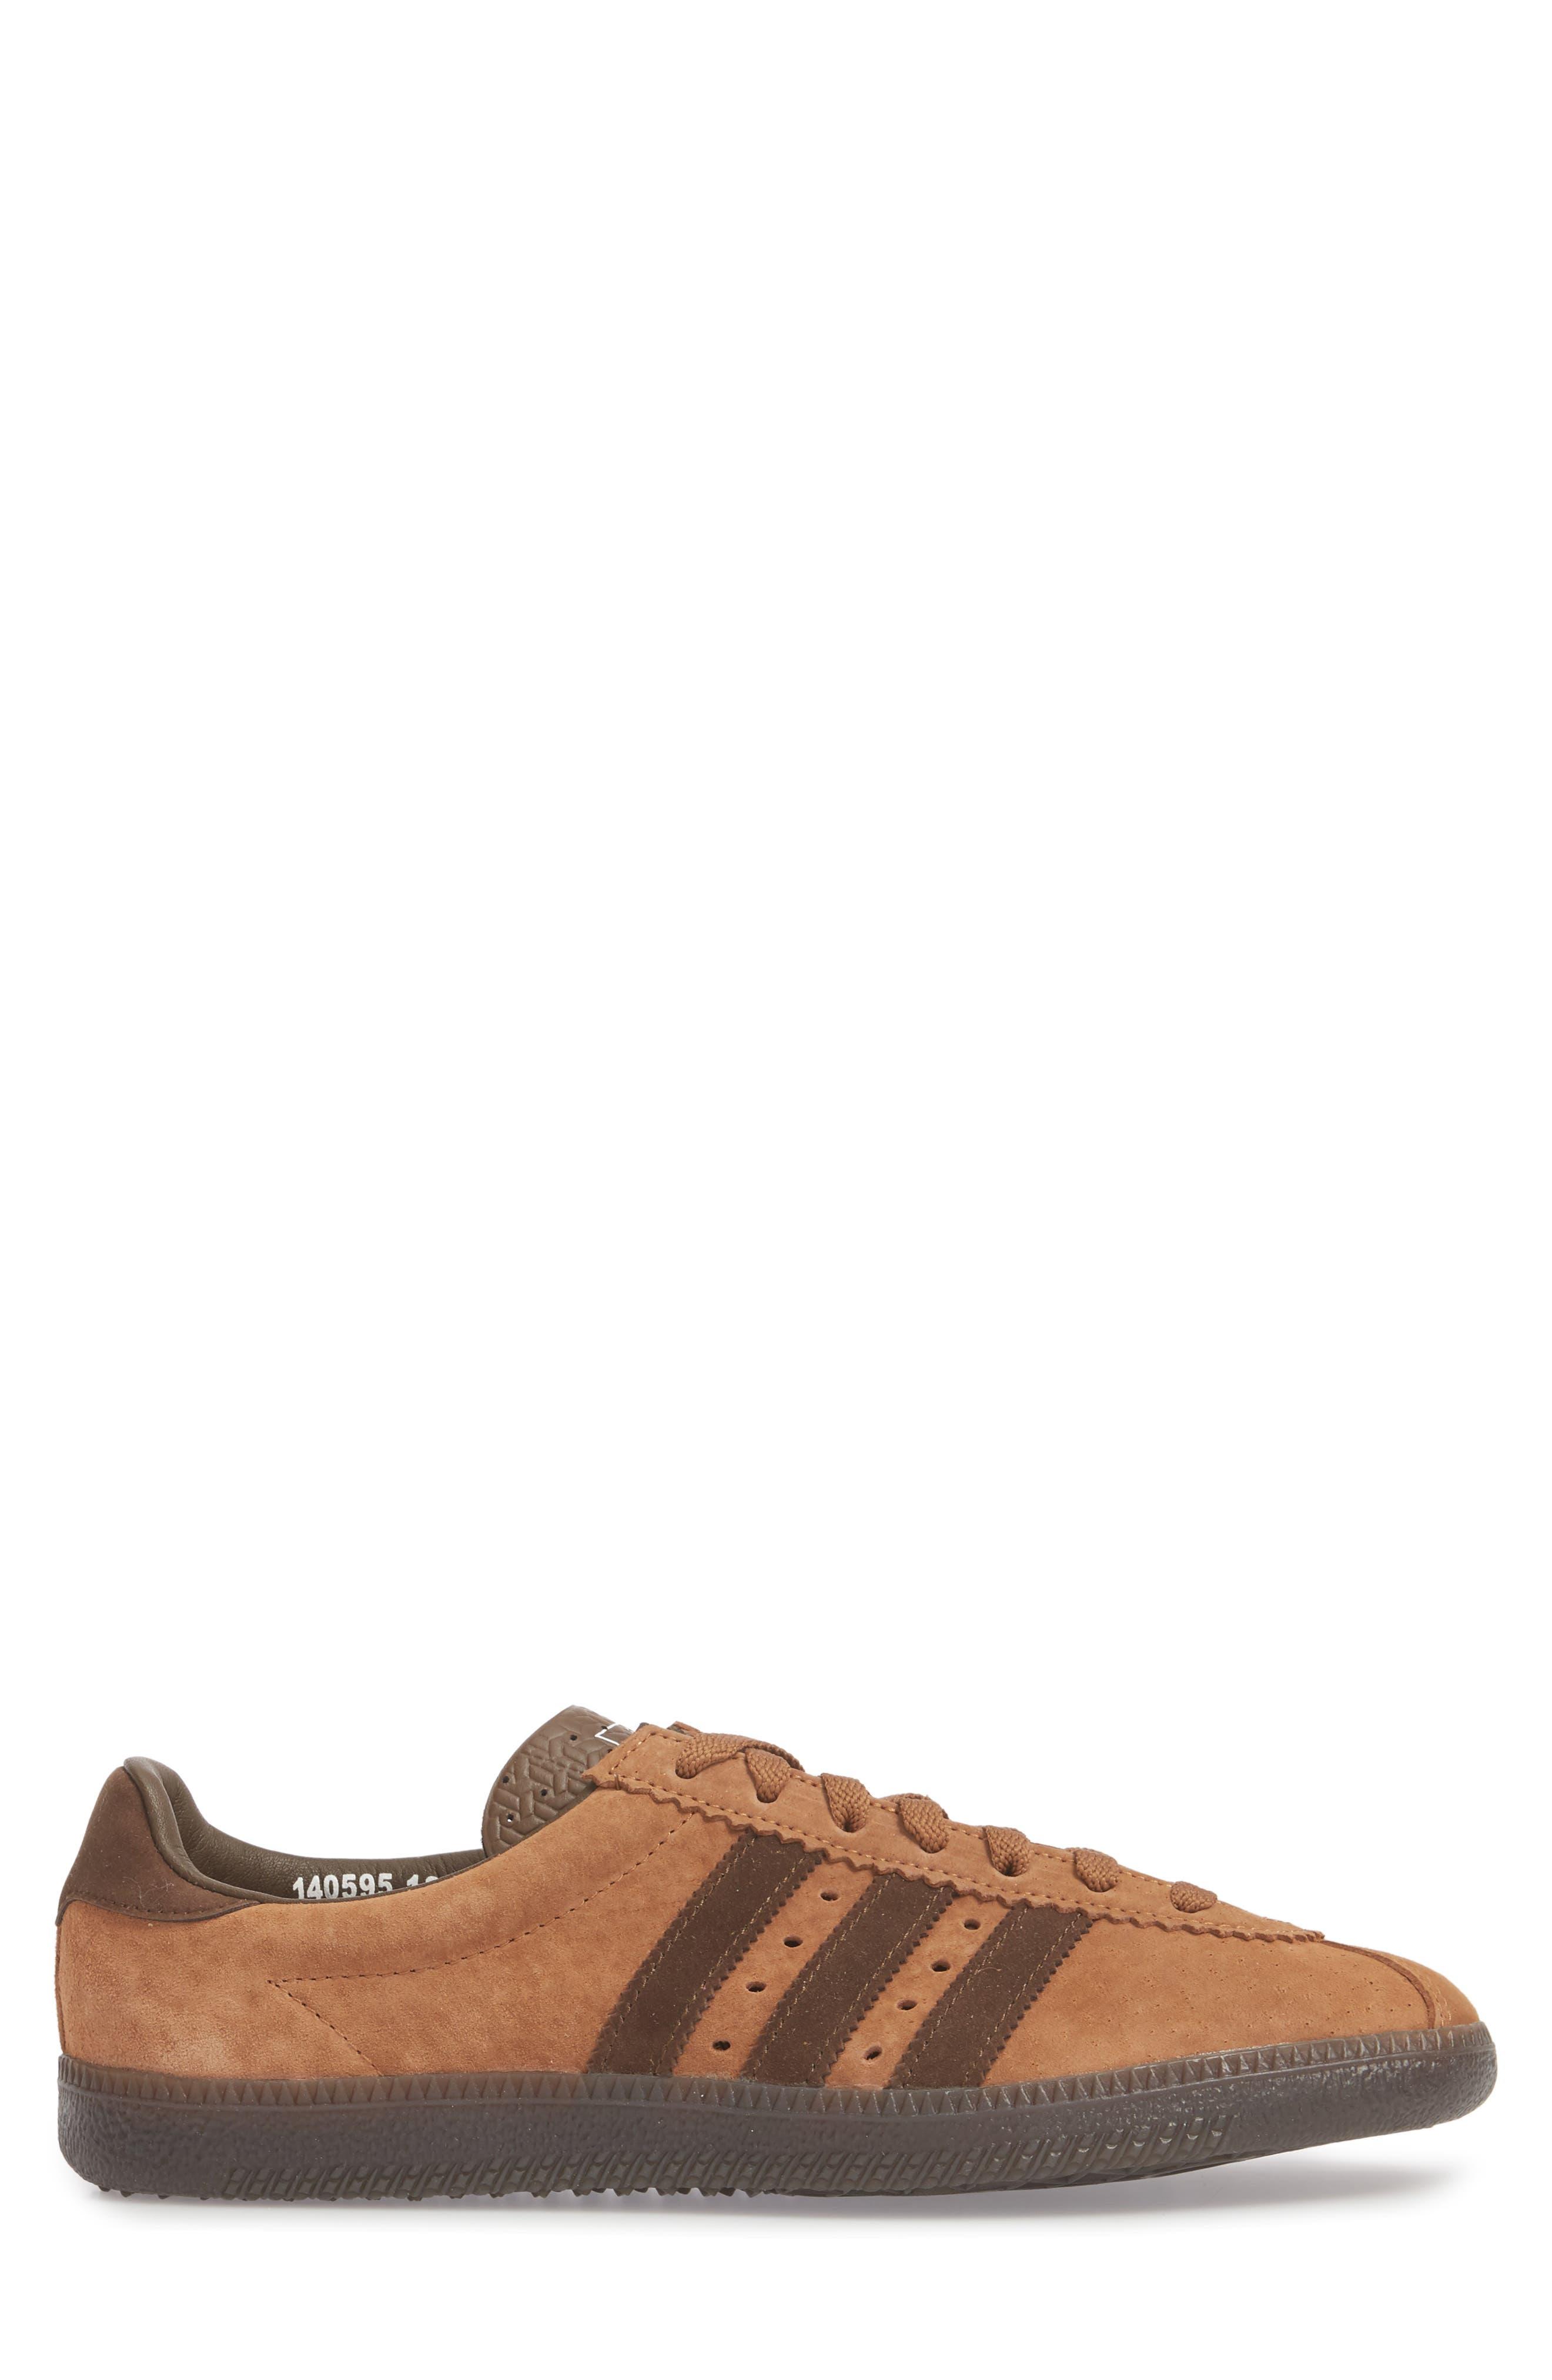 Padiham SPZL Sneaker,                             Alternate thumbnail 3, color,                             200